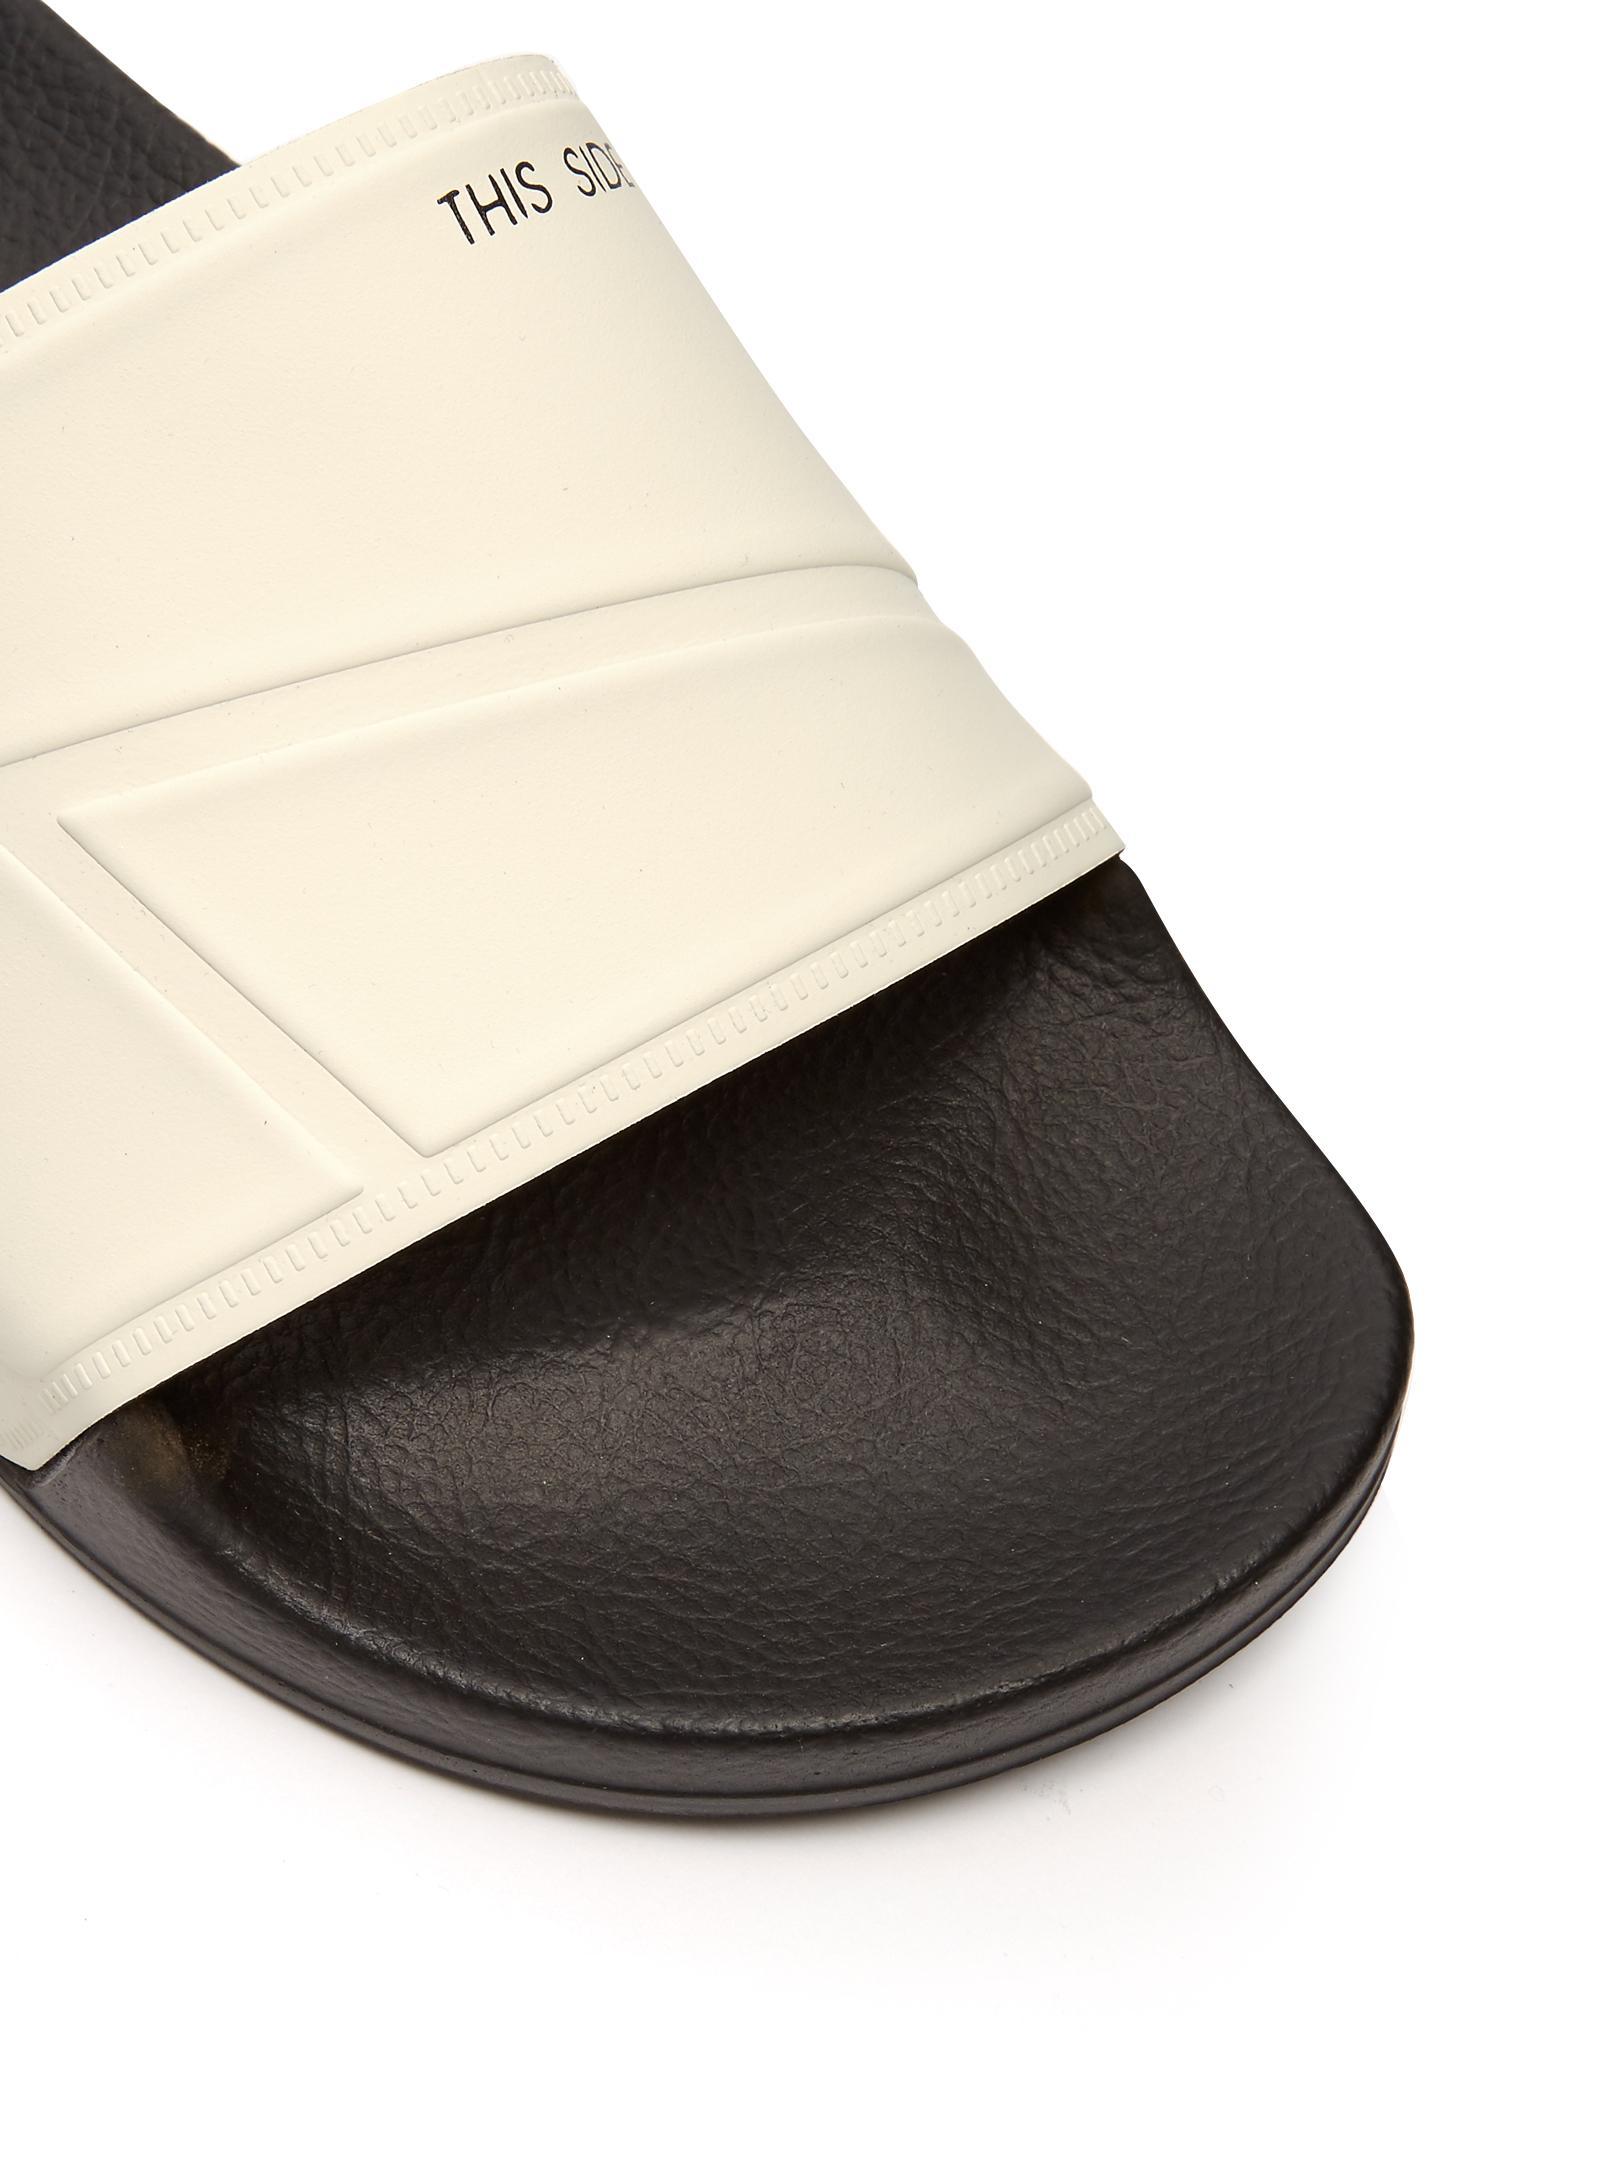 4eb628b5a258e Lyst - adidas By Raf Simons Bunny Adilette Pool Slides in Black for Men